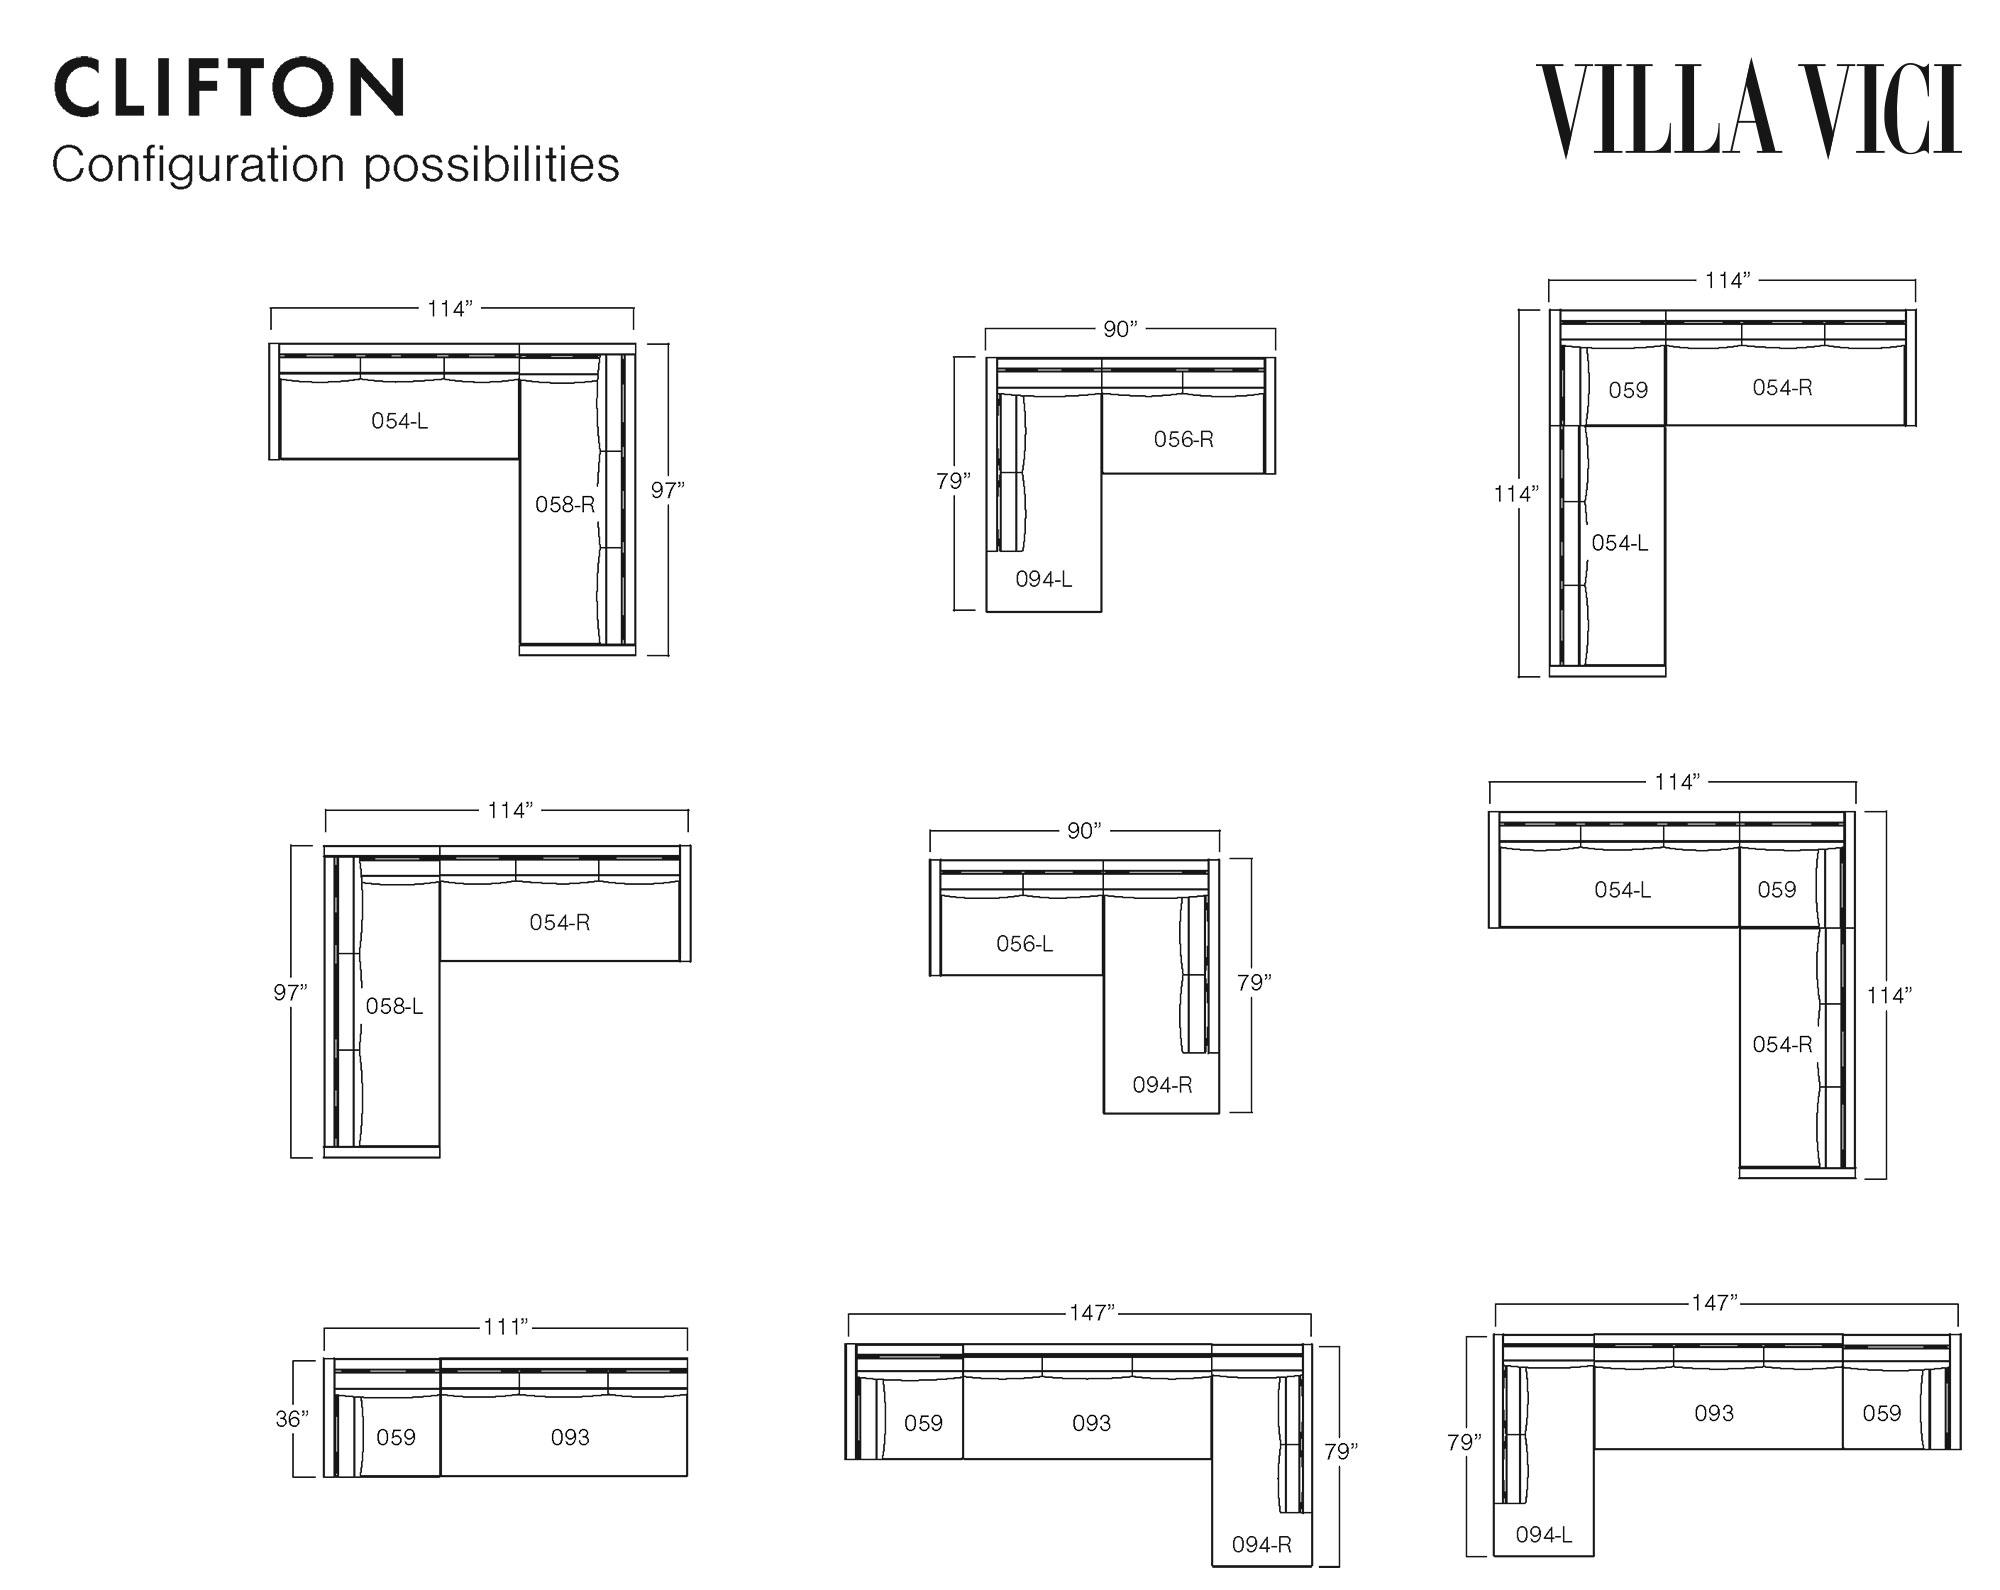 Clifton_configurations_2019